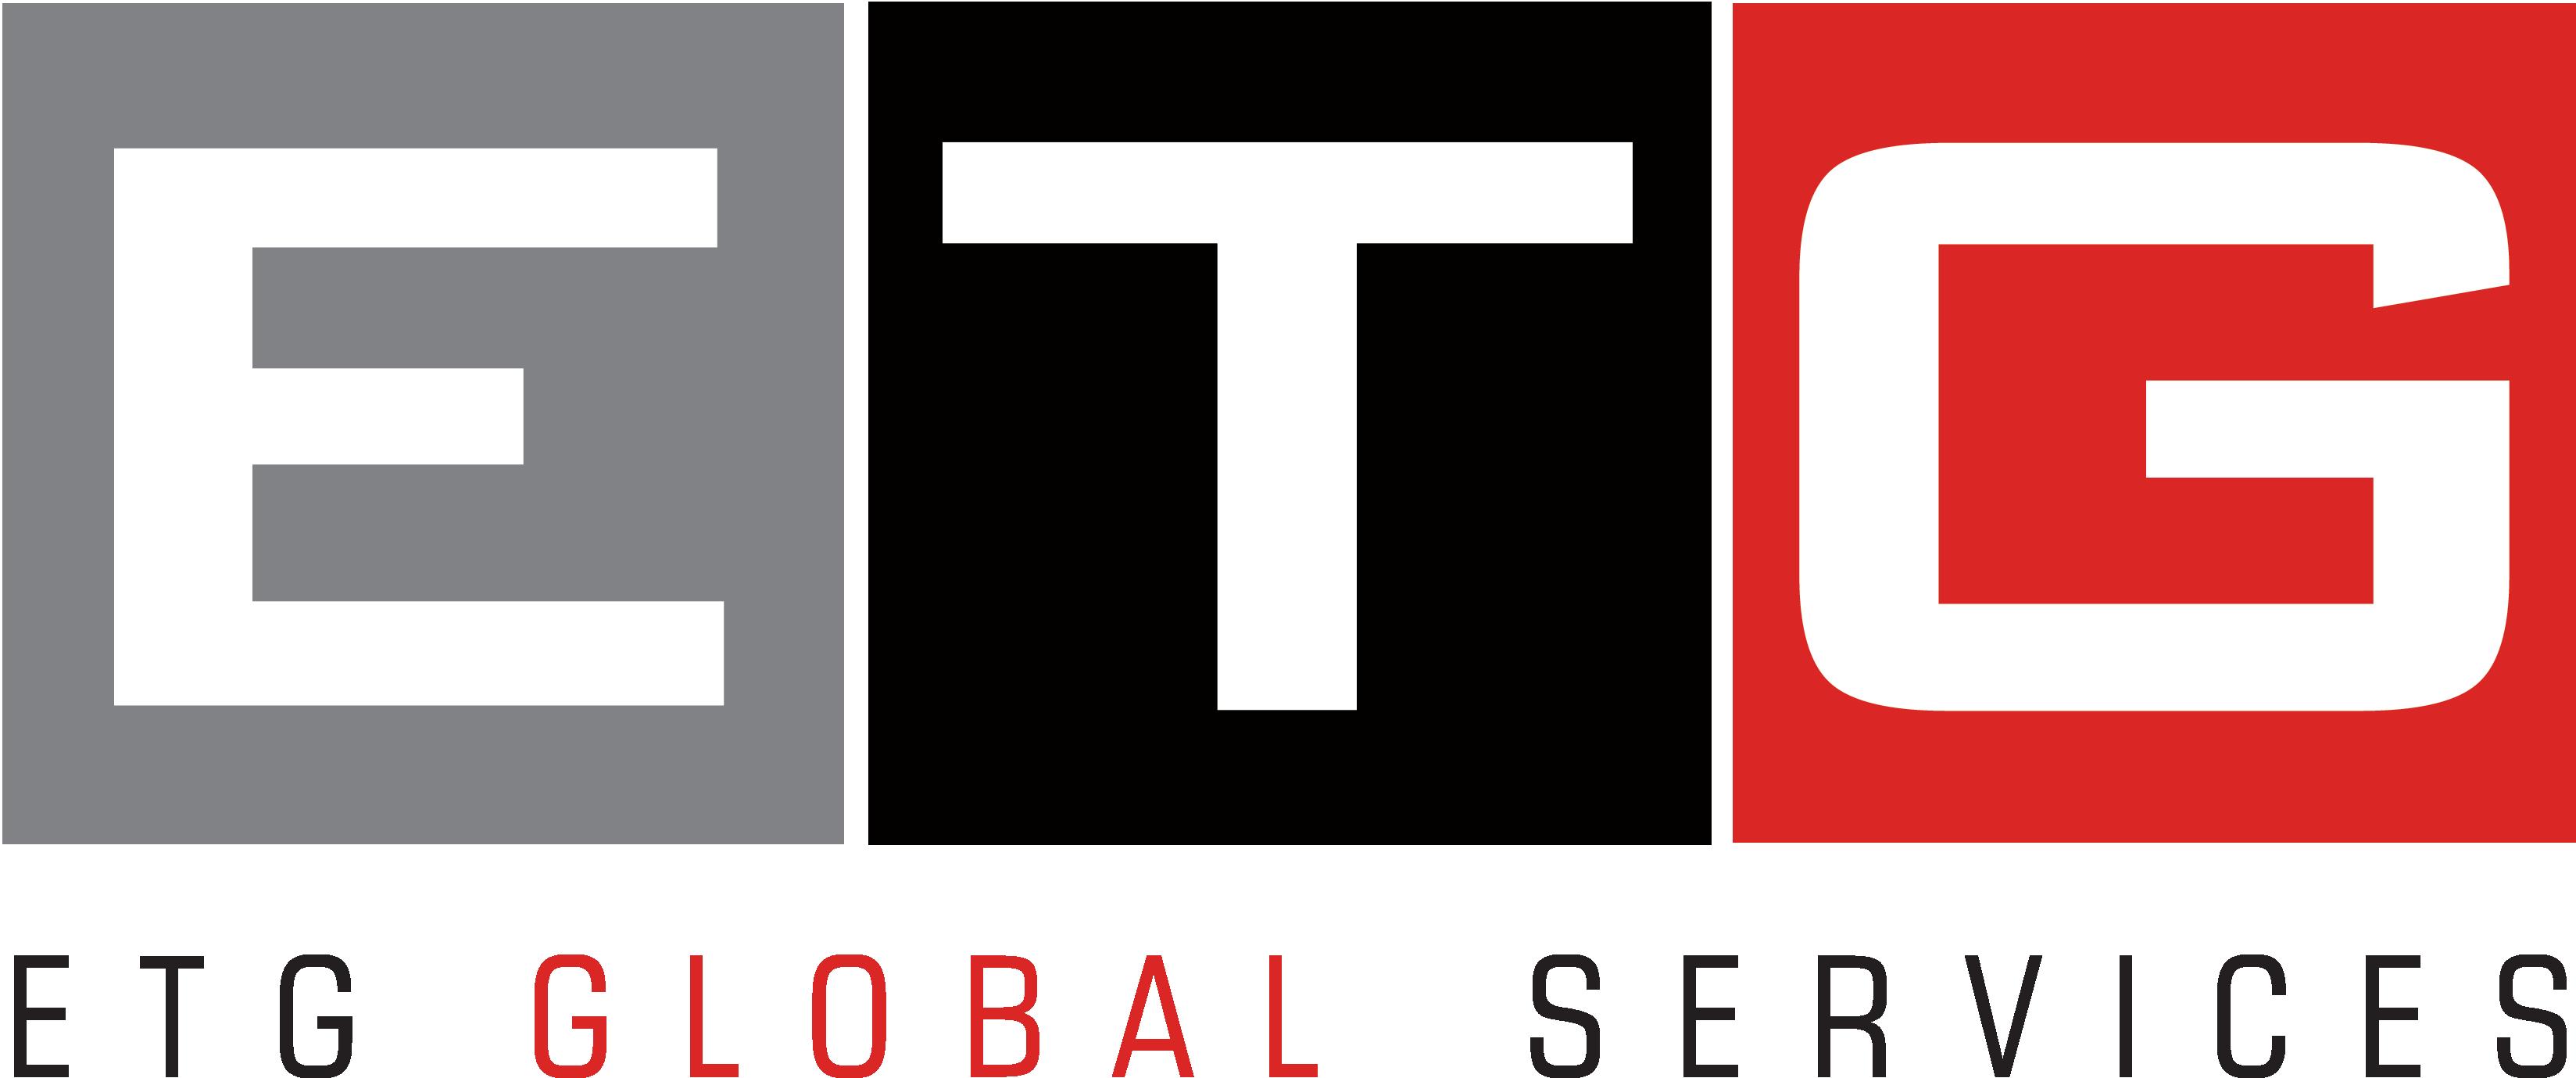 ETG Global Services - An Etisbew Technology Group Company